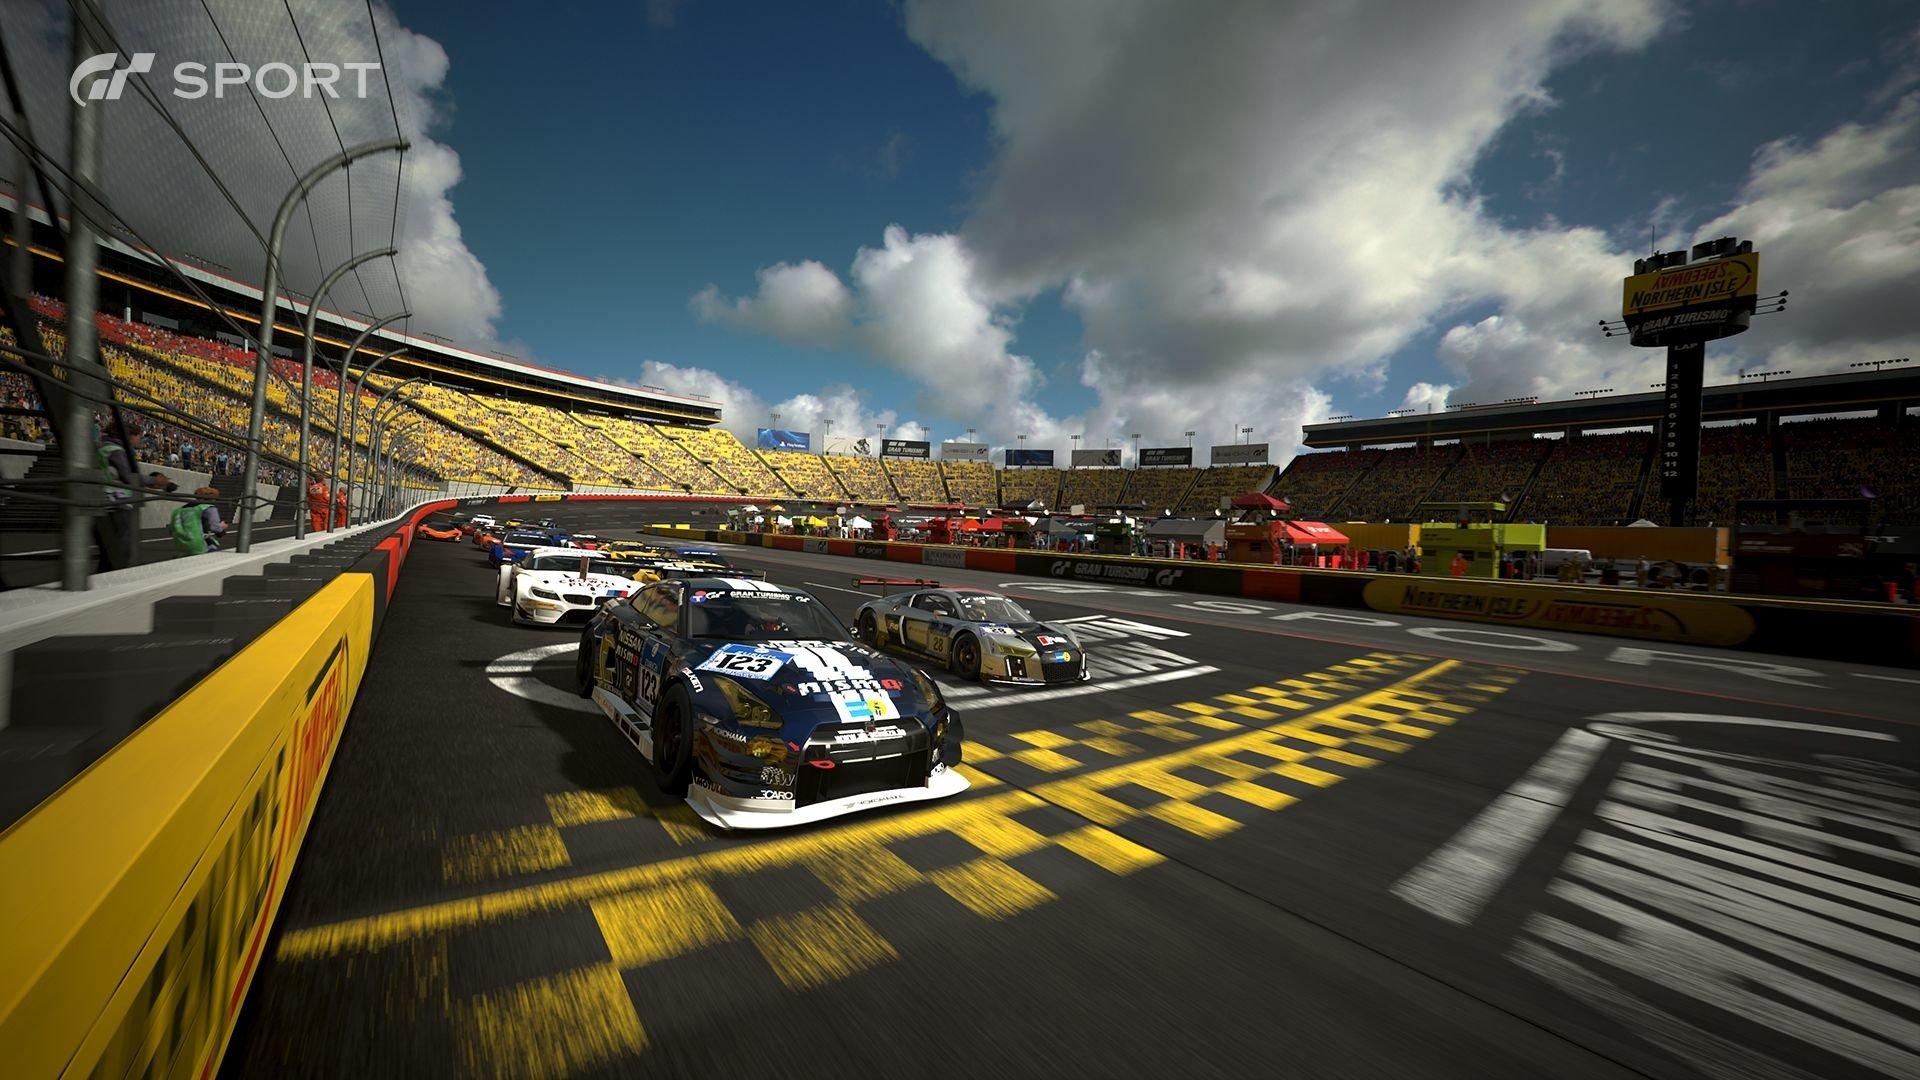 Gran Turismo Wallpaper Hd: Download Gran Turismo Sport HD Wallpapers